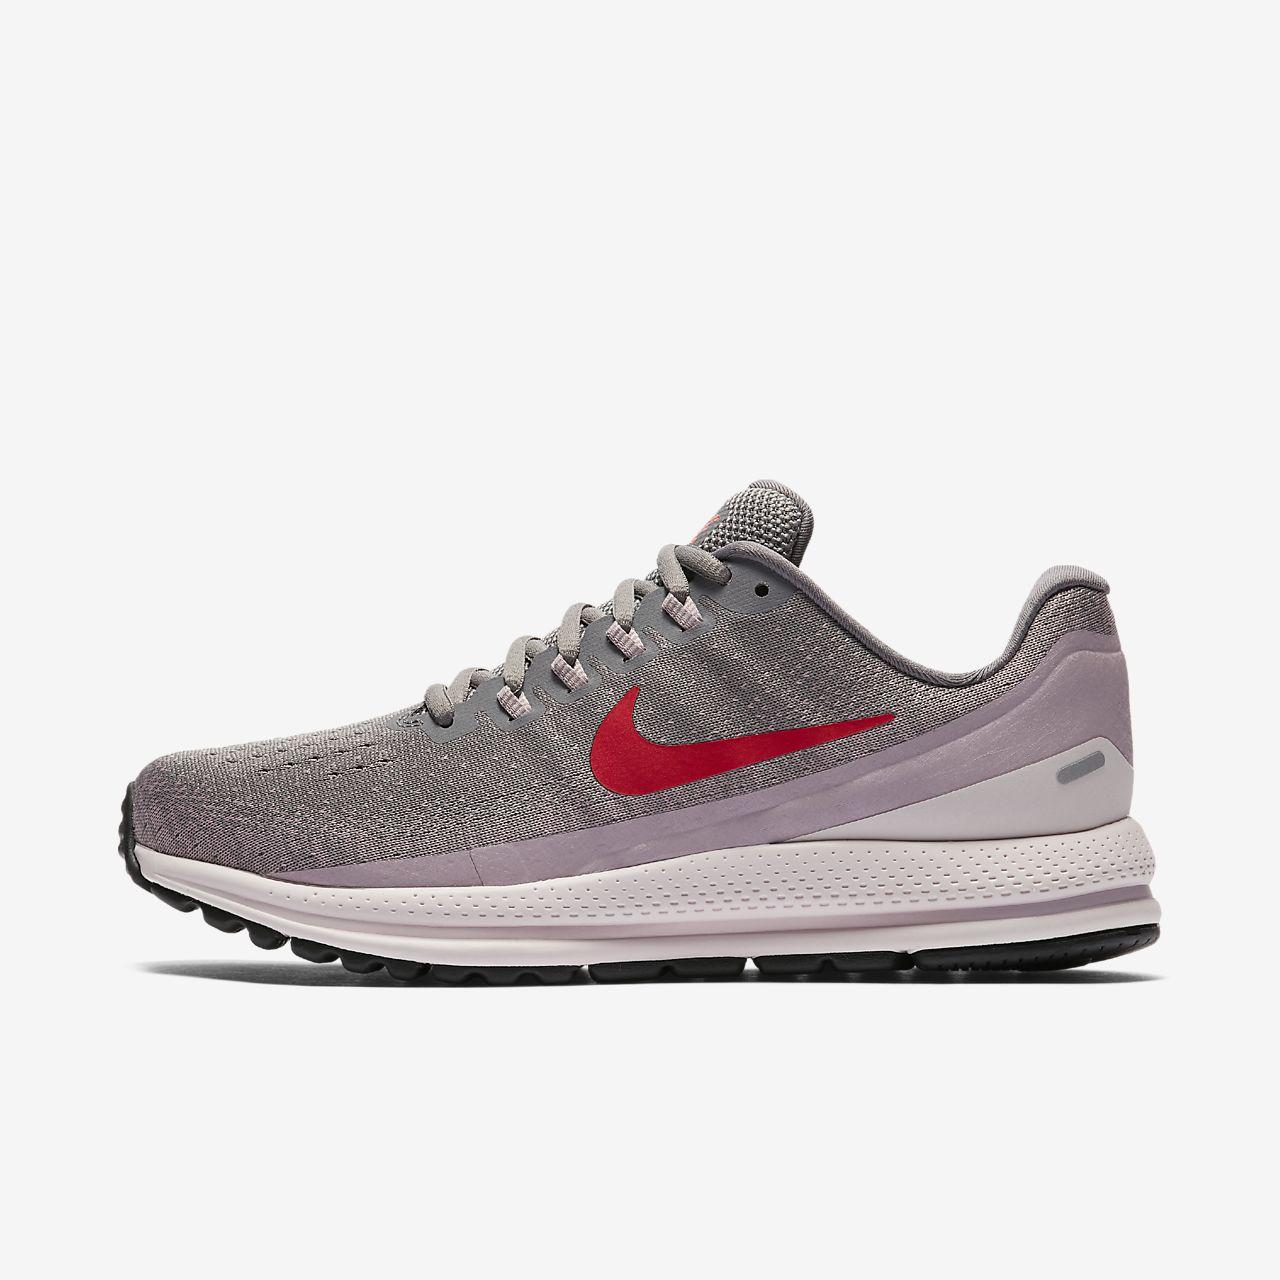 03976e456b00 Женские беговые кроссовки Nike Air Zoom Vomero 13